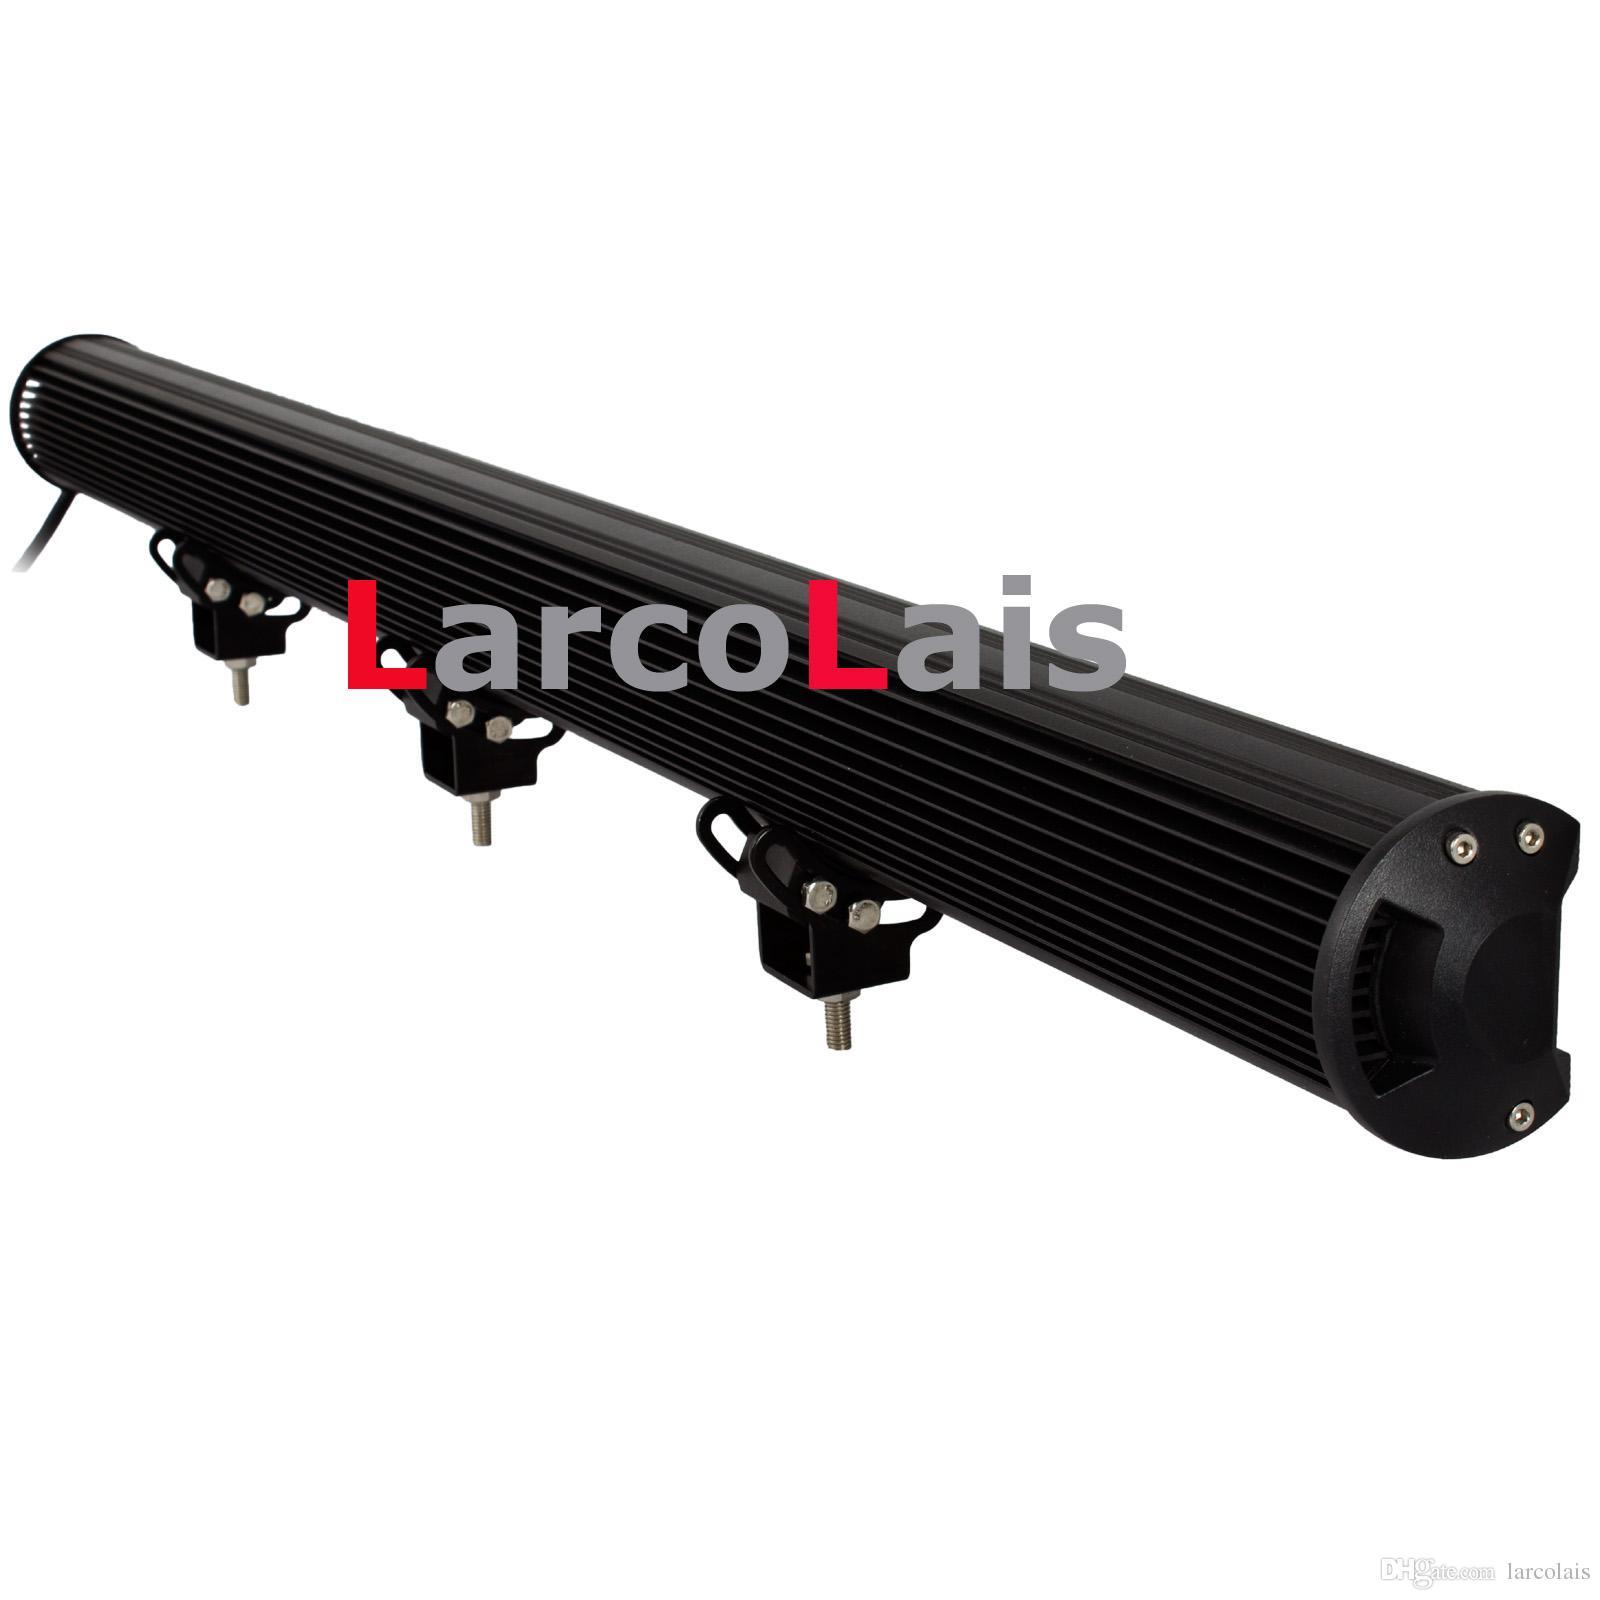 43-Zoll-288W CREE-LED-Lichtleiste Jeep-LKW-Anhänger 4x4 4WD SUV ATV Off-Road-Auto 12V 24V-Arbeits-Arbeitslampen Bleistift-Spread-Strahl